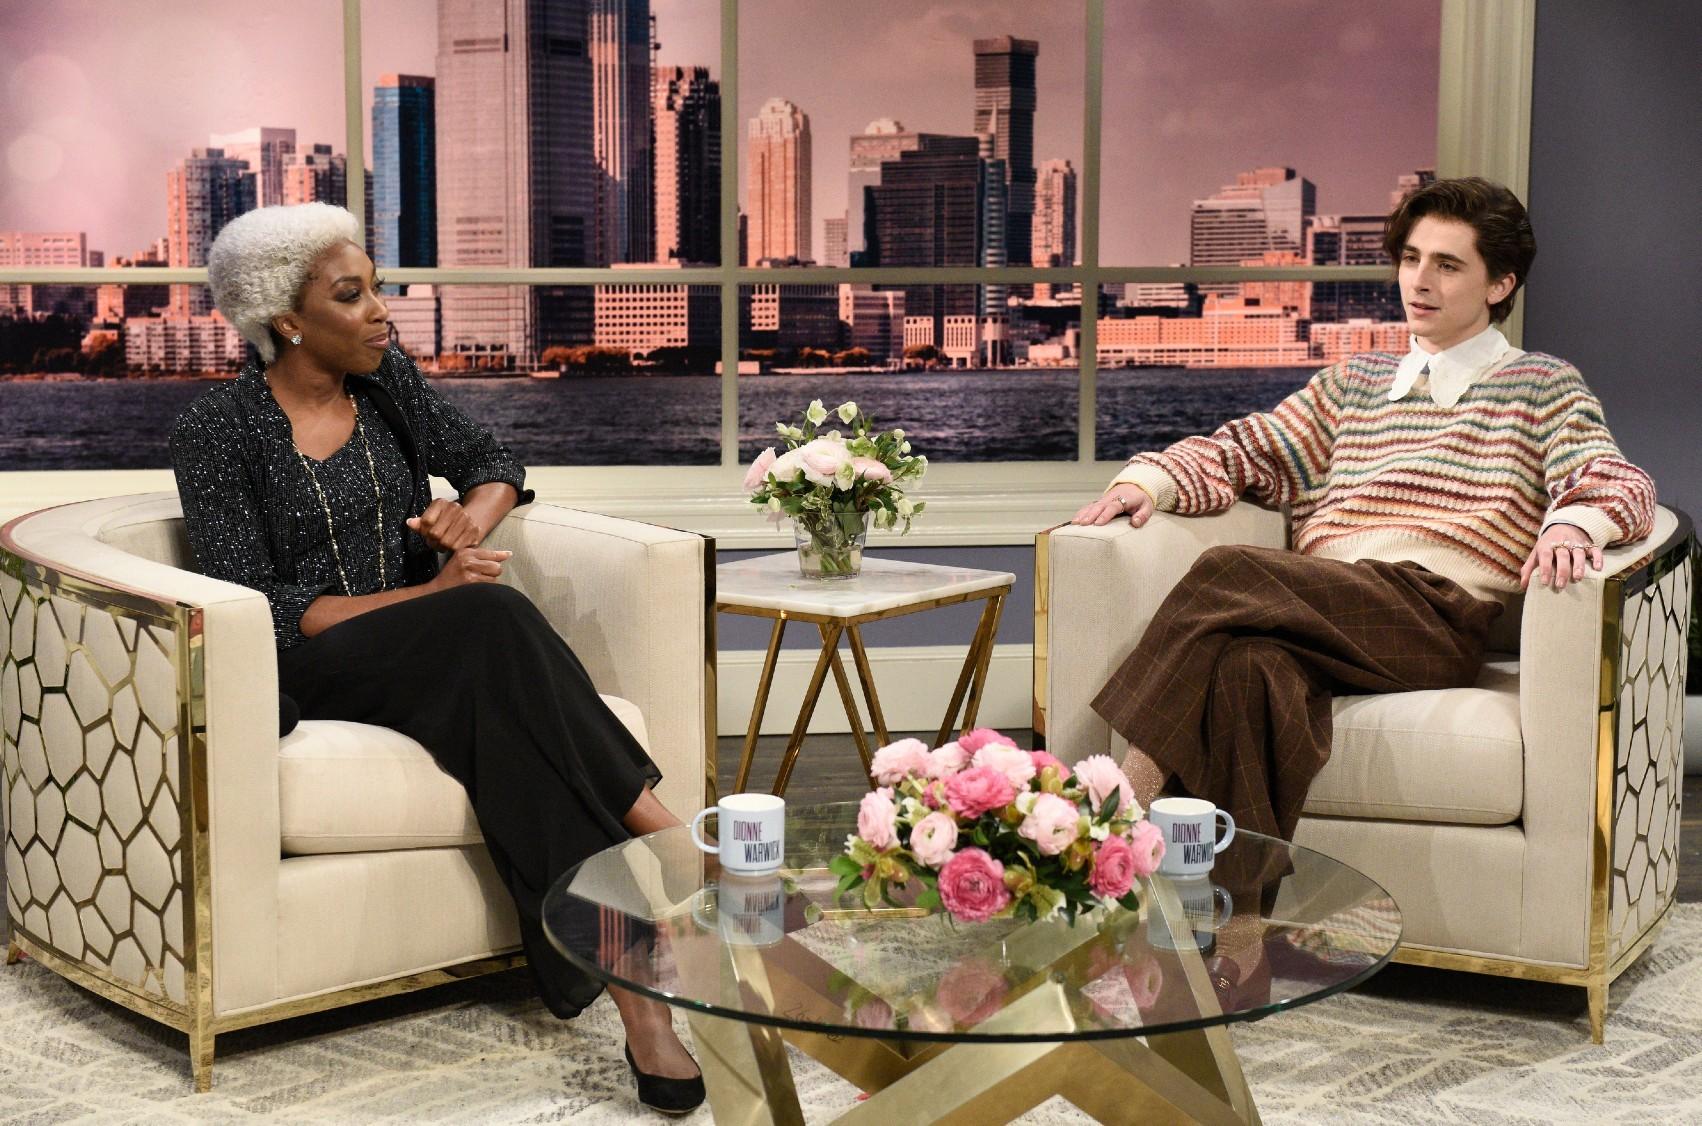 Ego Nwodim, Timothee Chalamet on SNL